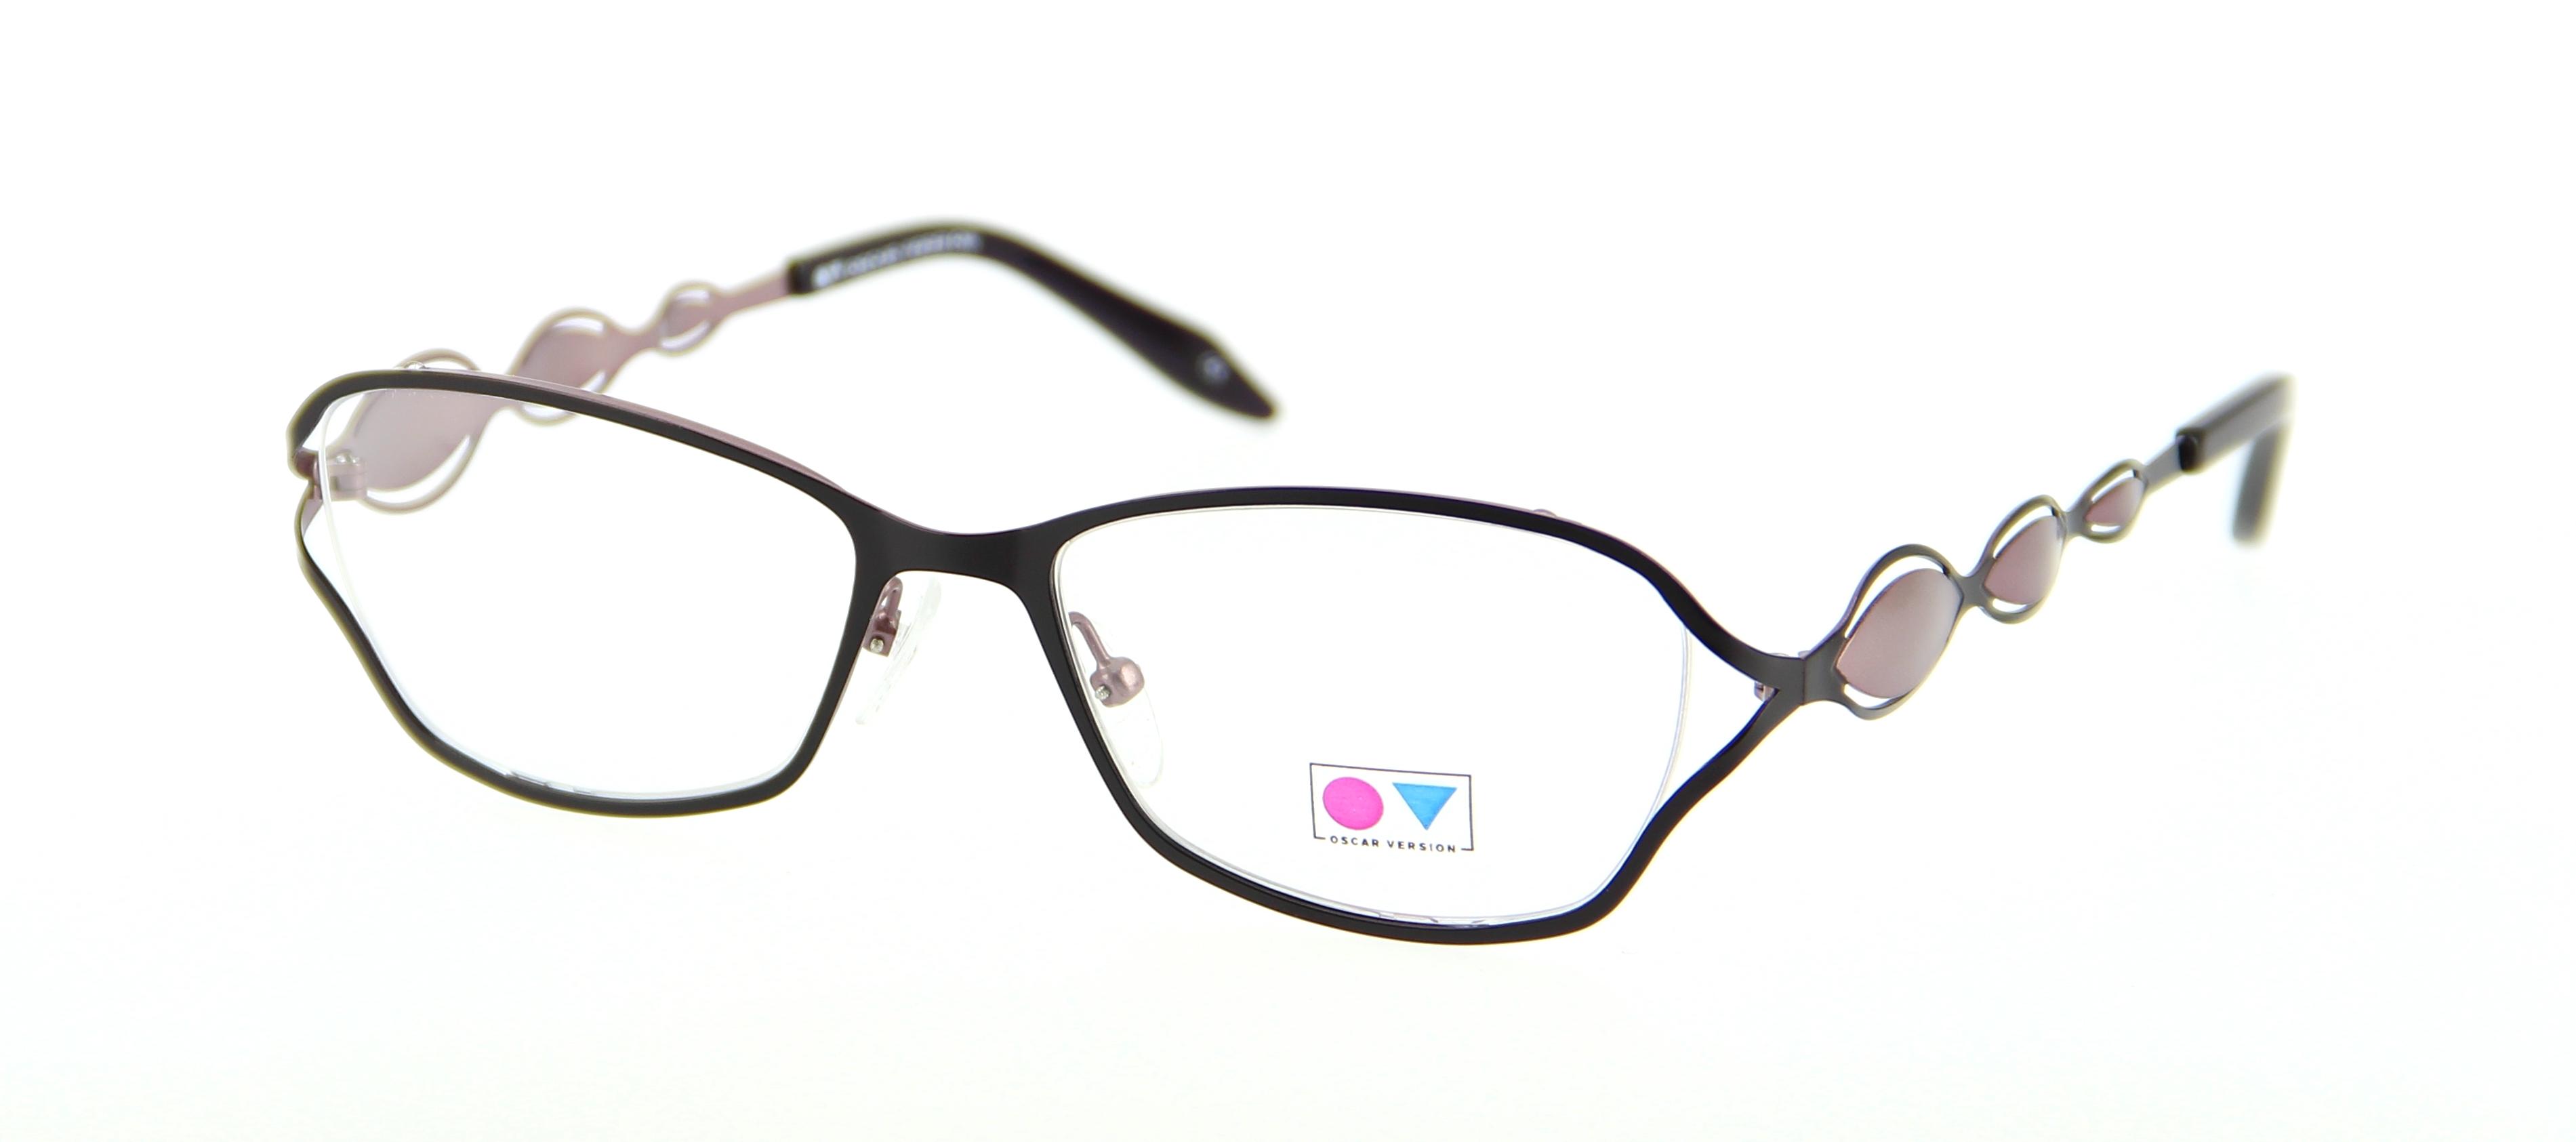 Eyeglasses OSCAR VERSION OV 1401 PRRO 52/17 Woman Prune ...